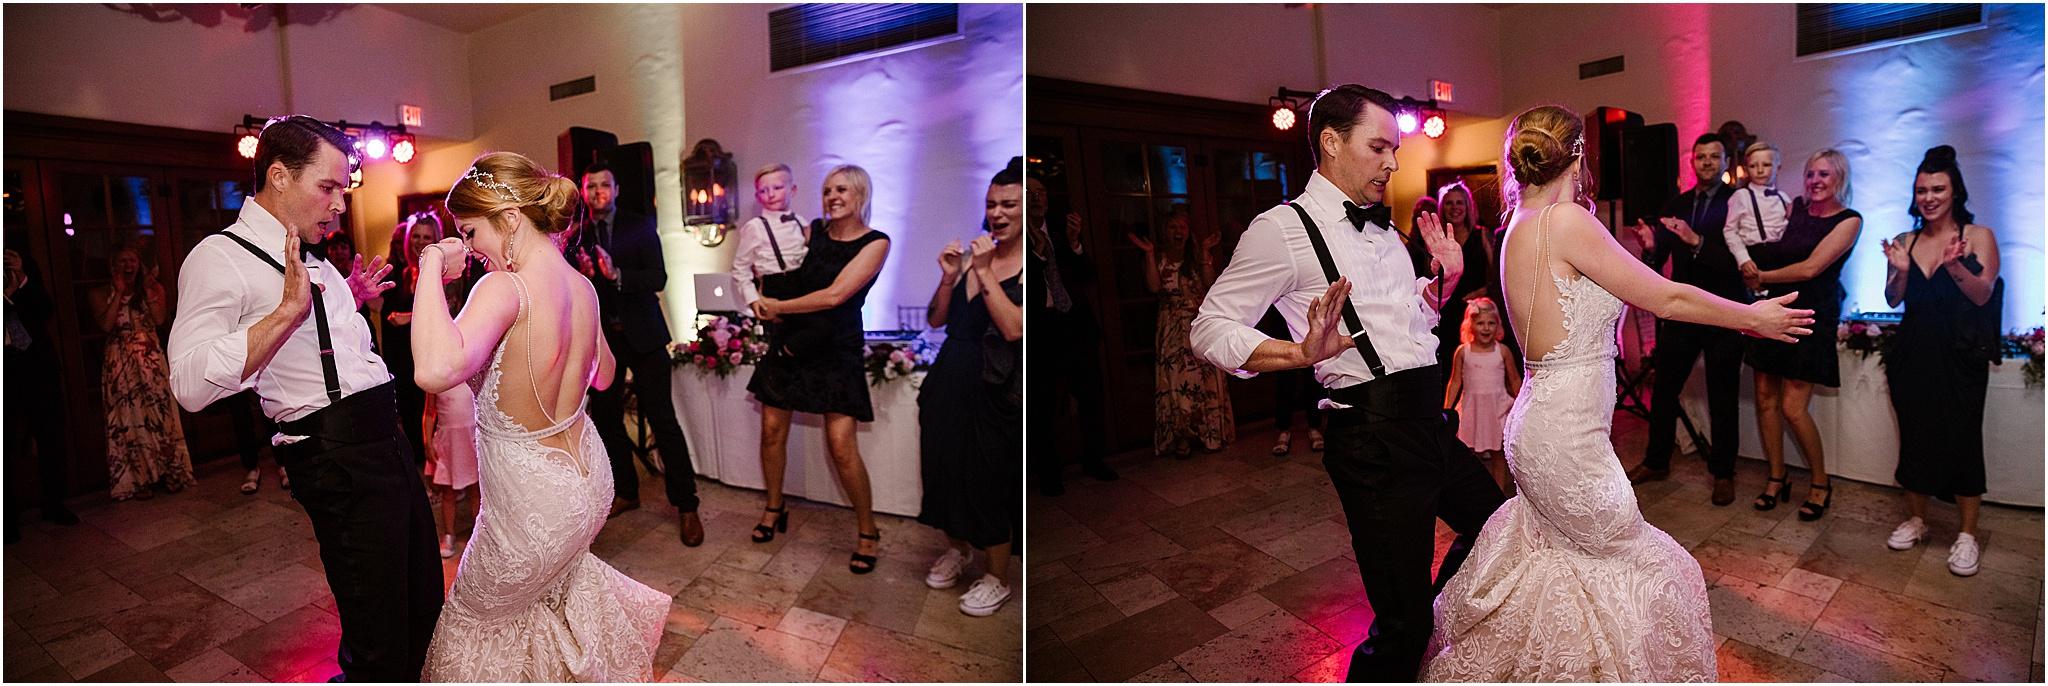 BLUE ROSE PHOTOGRAPHY SANTA FE WEDDING_74